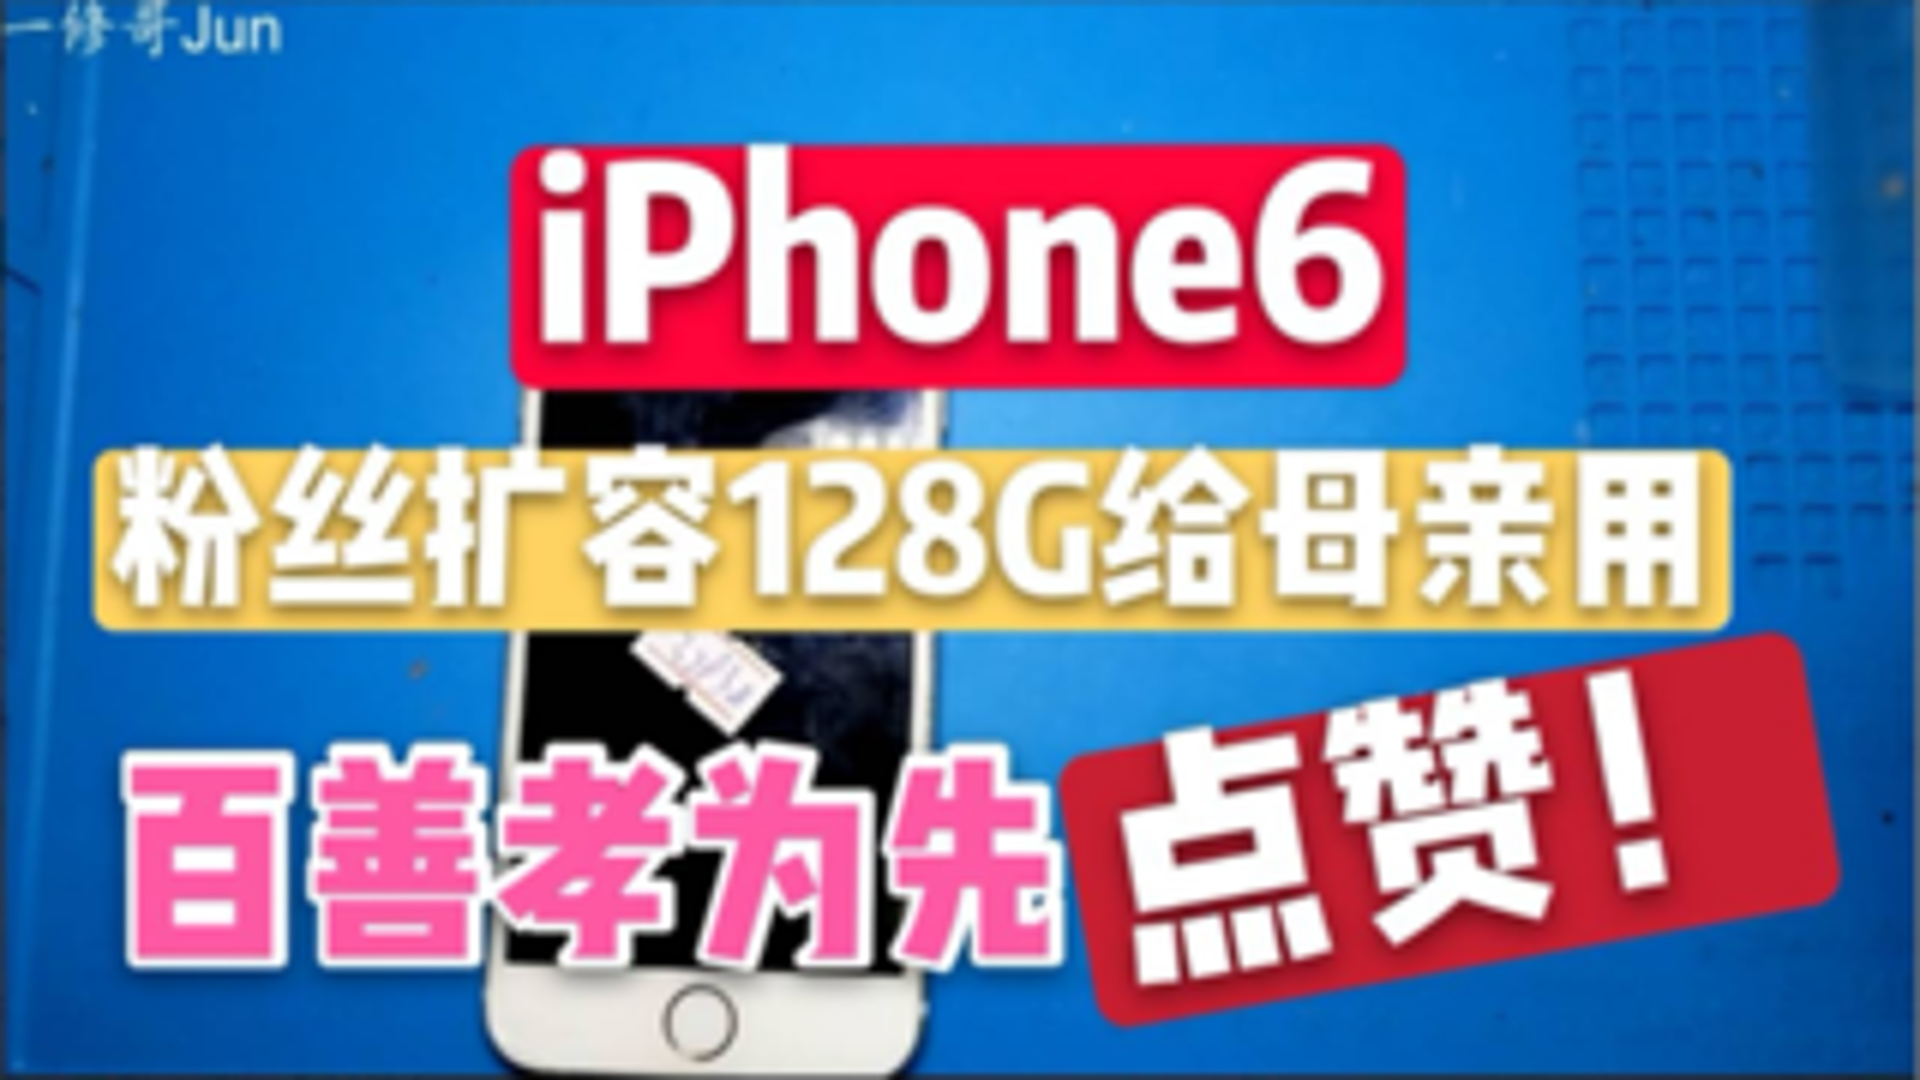 iPhone6扩容到128G给母亲用,百行孝为先,点赞!